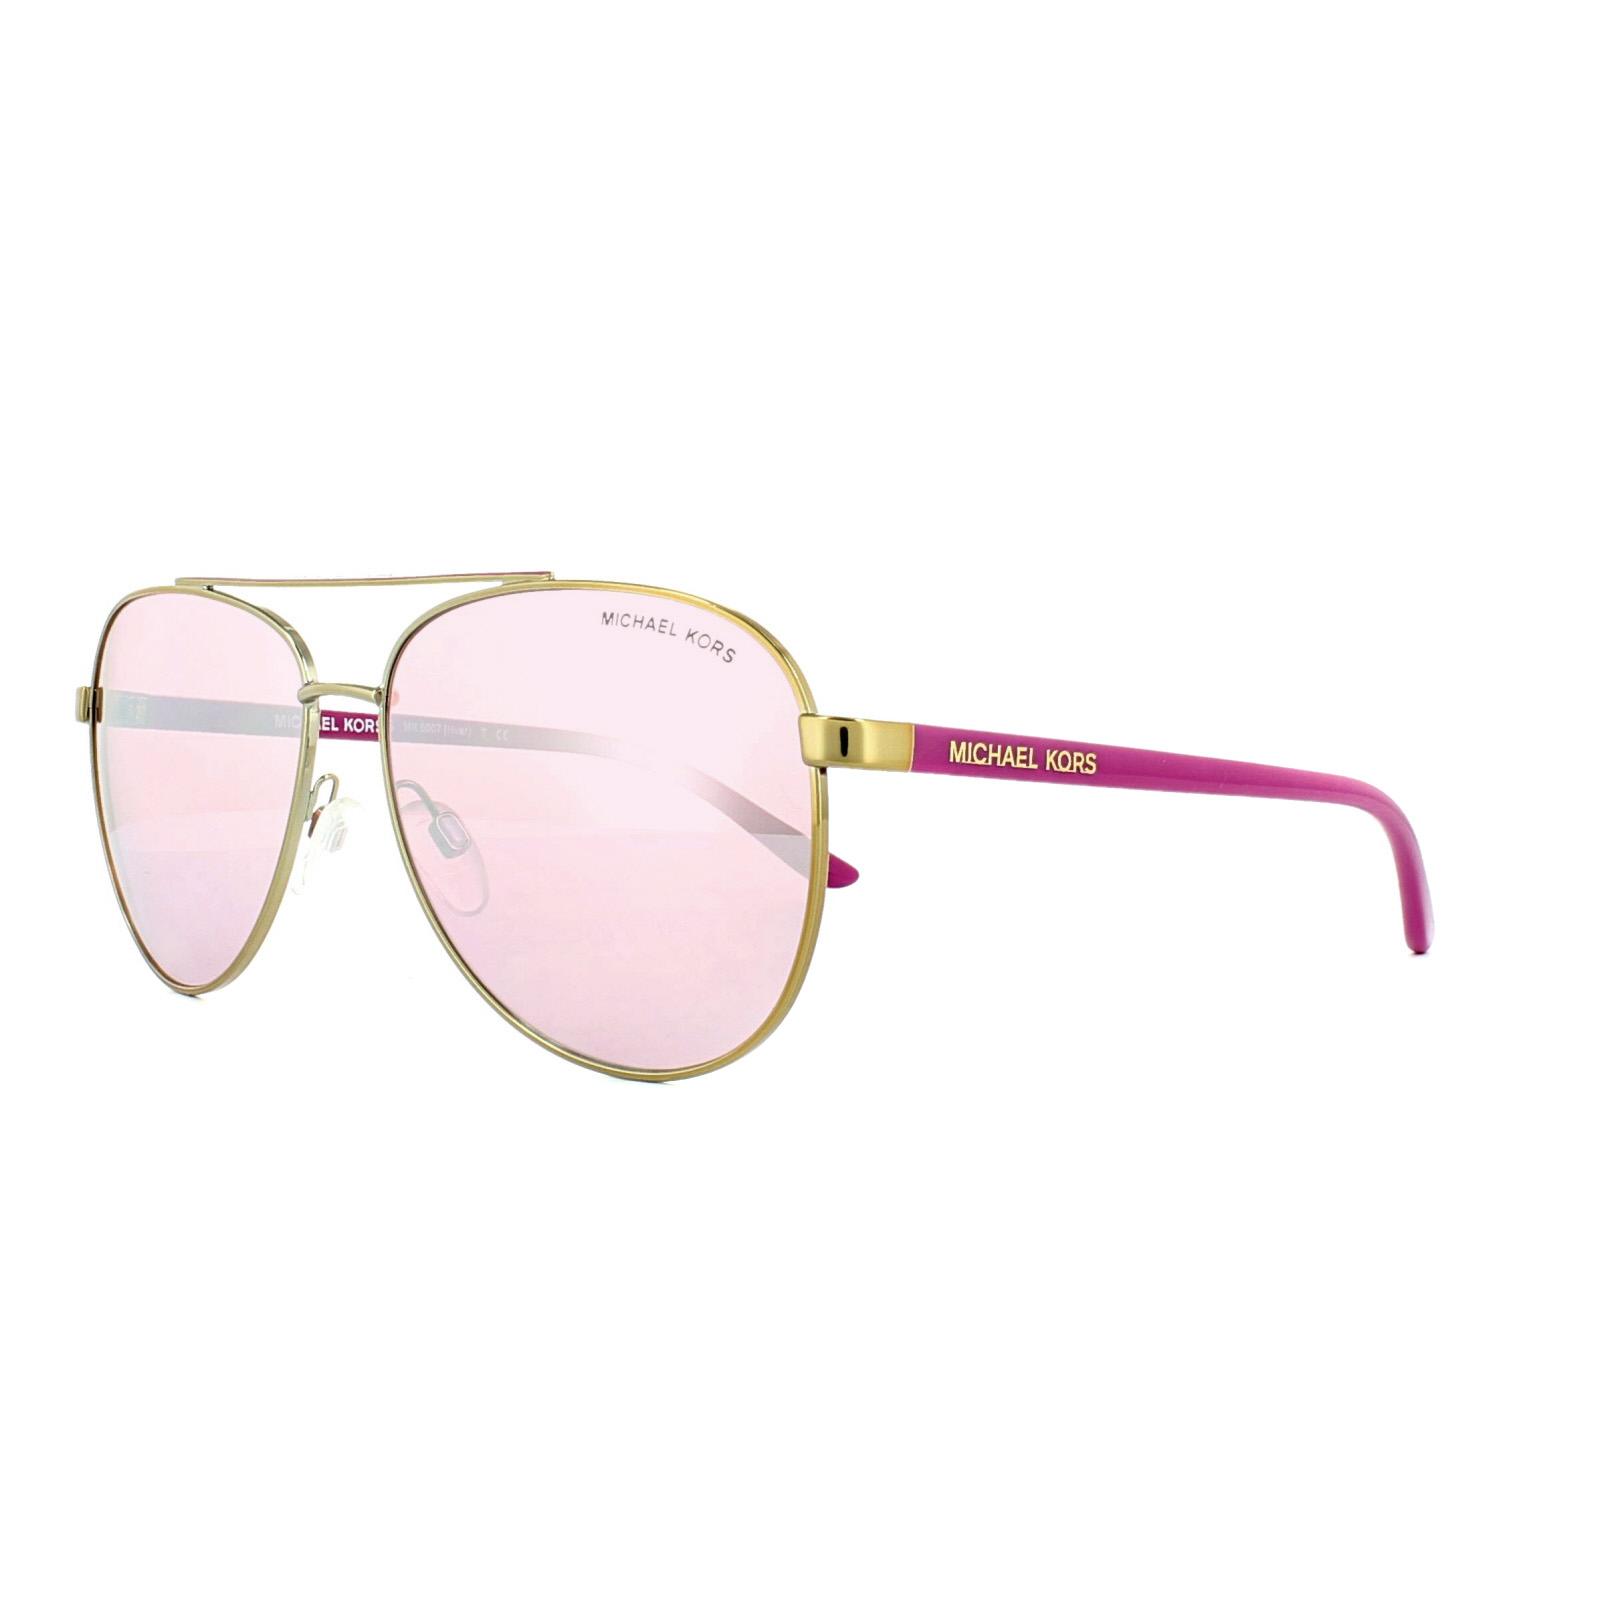 1f6def4a8f4c Cheap Michael Kors Hvar 5007 Sunglasses - Discounted Sunglasses